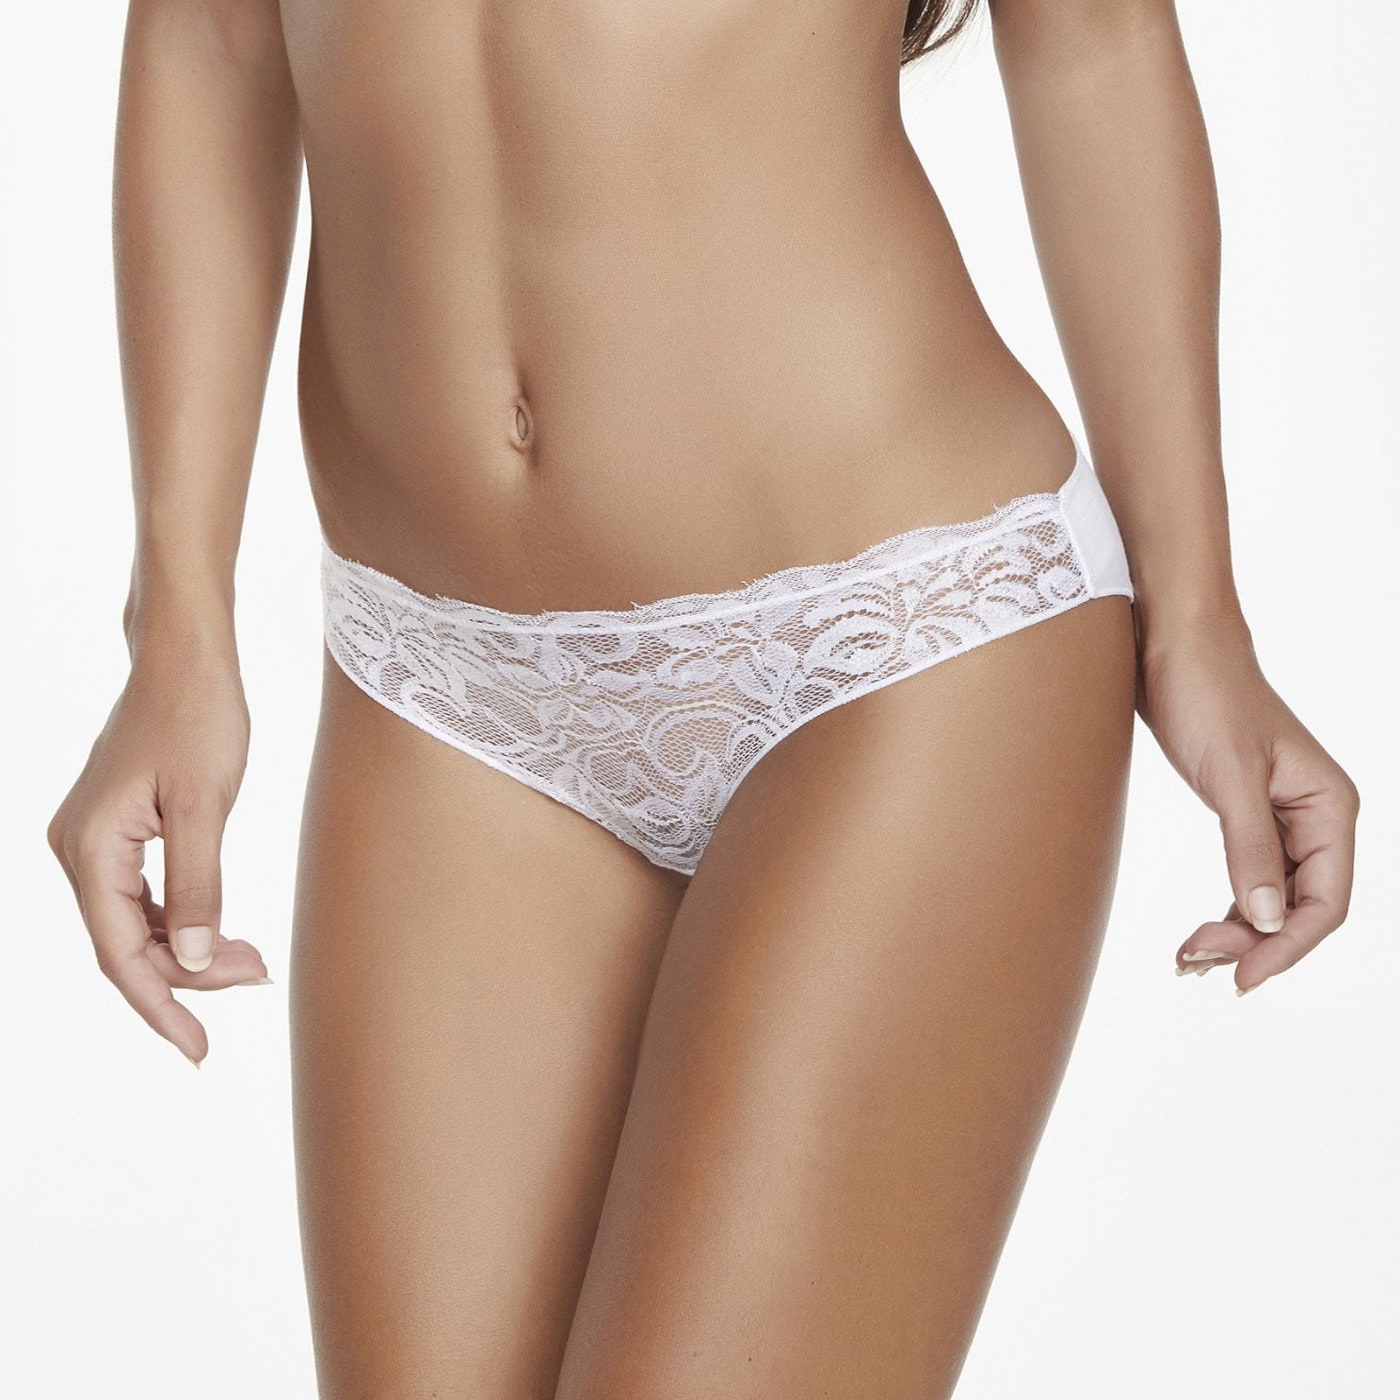 Womens panties Pierre Cardin LILIUM